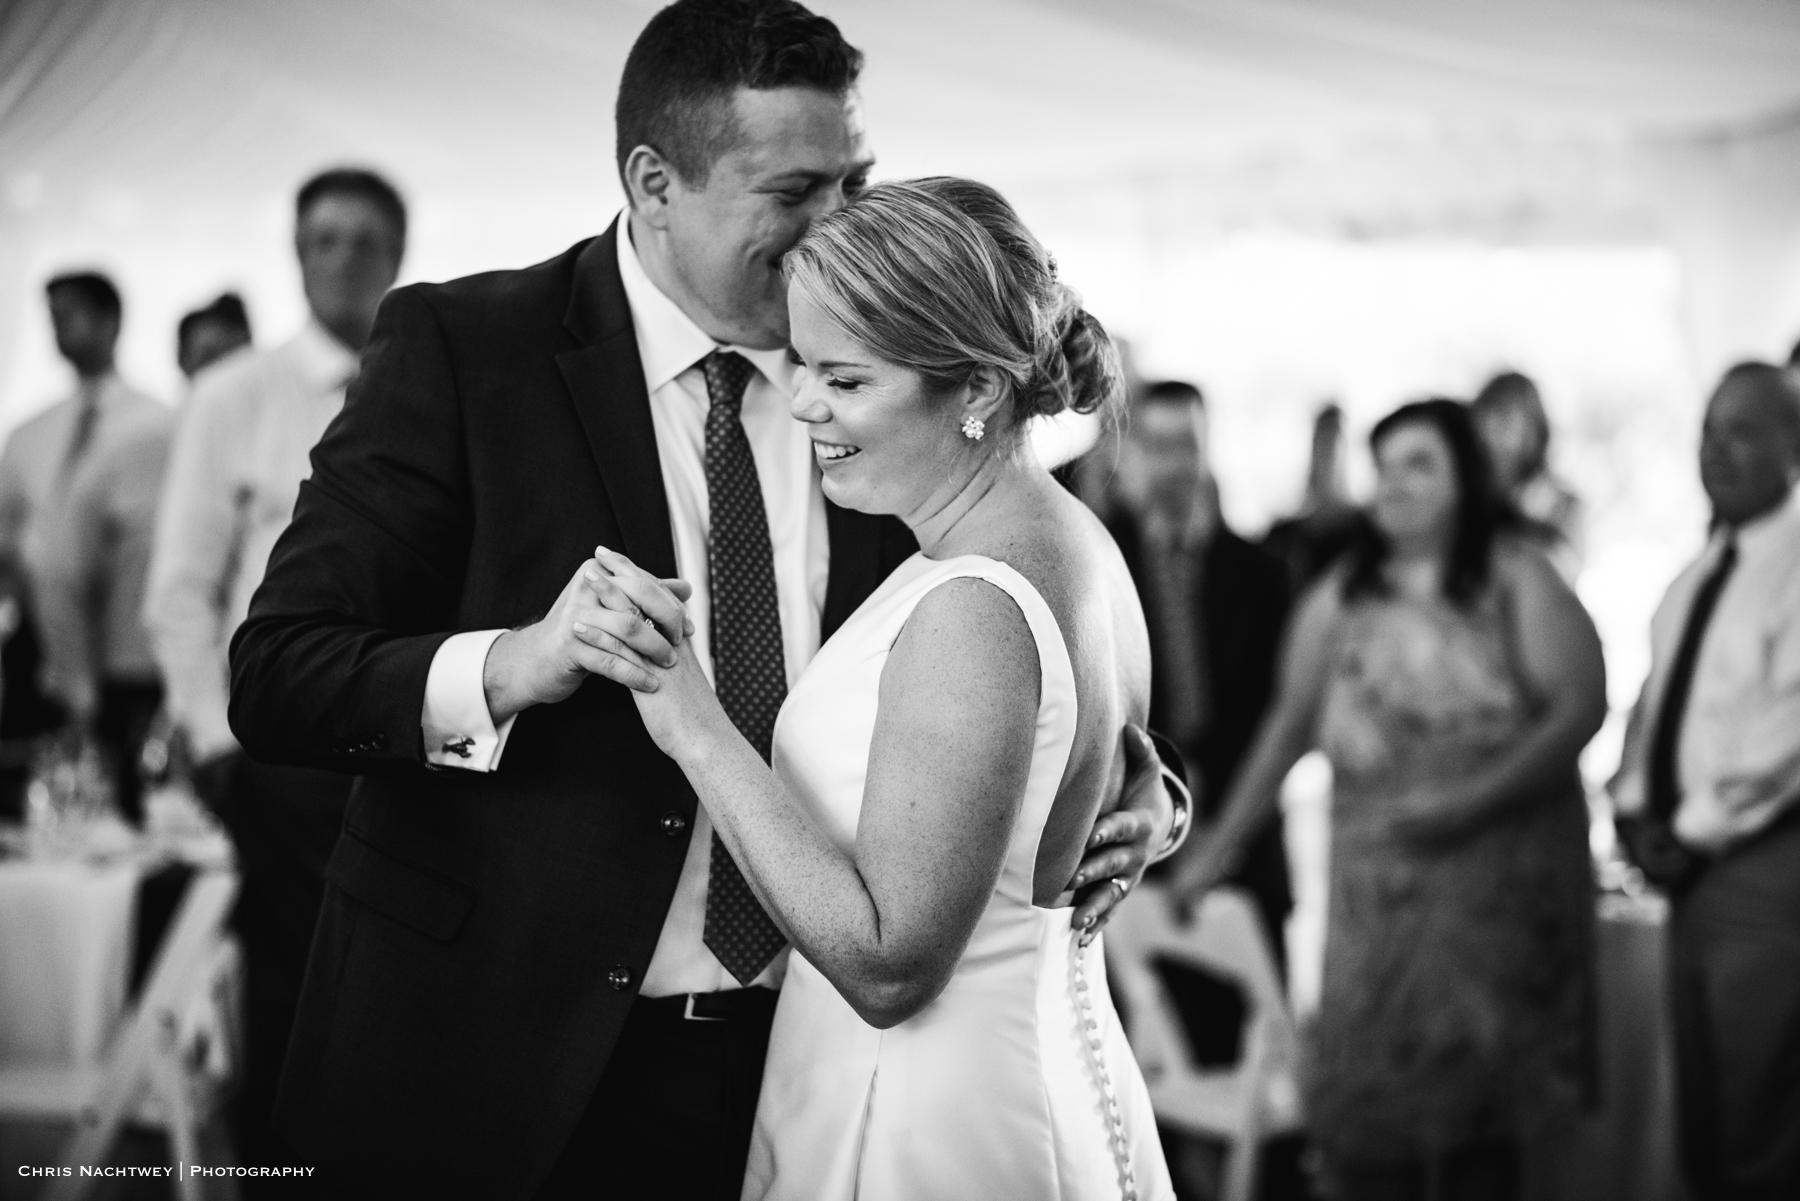 photos-wedding-haley-mansion-mystic-ct-chris-nachtwey-photography-2019-35.jpg